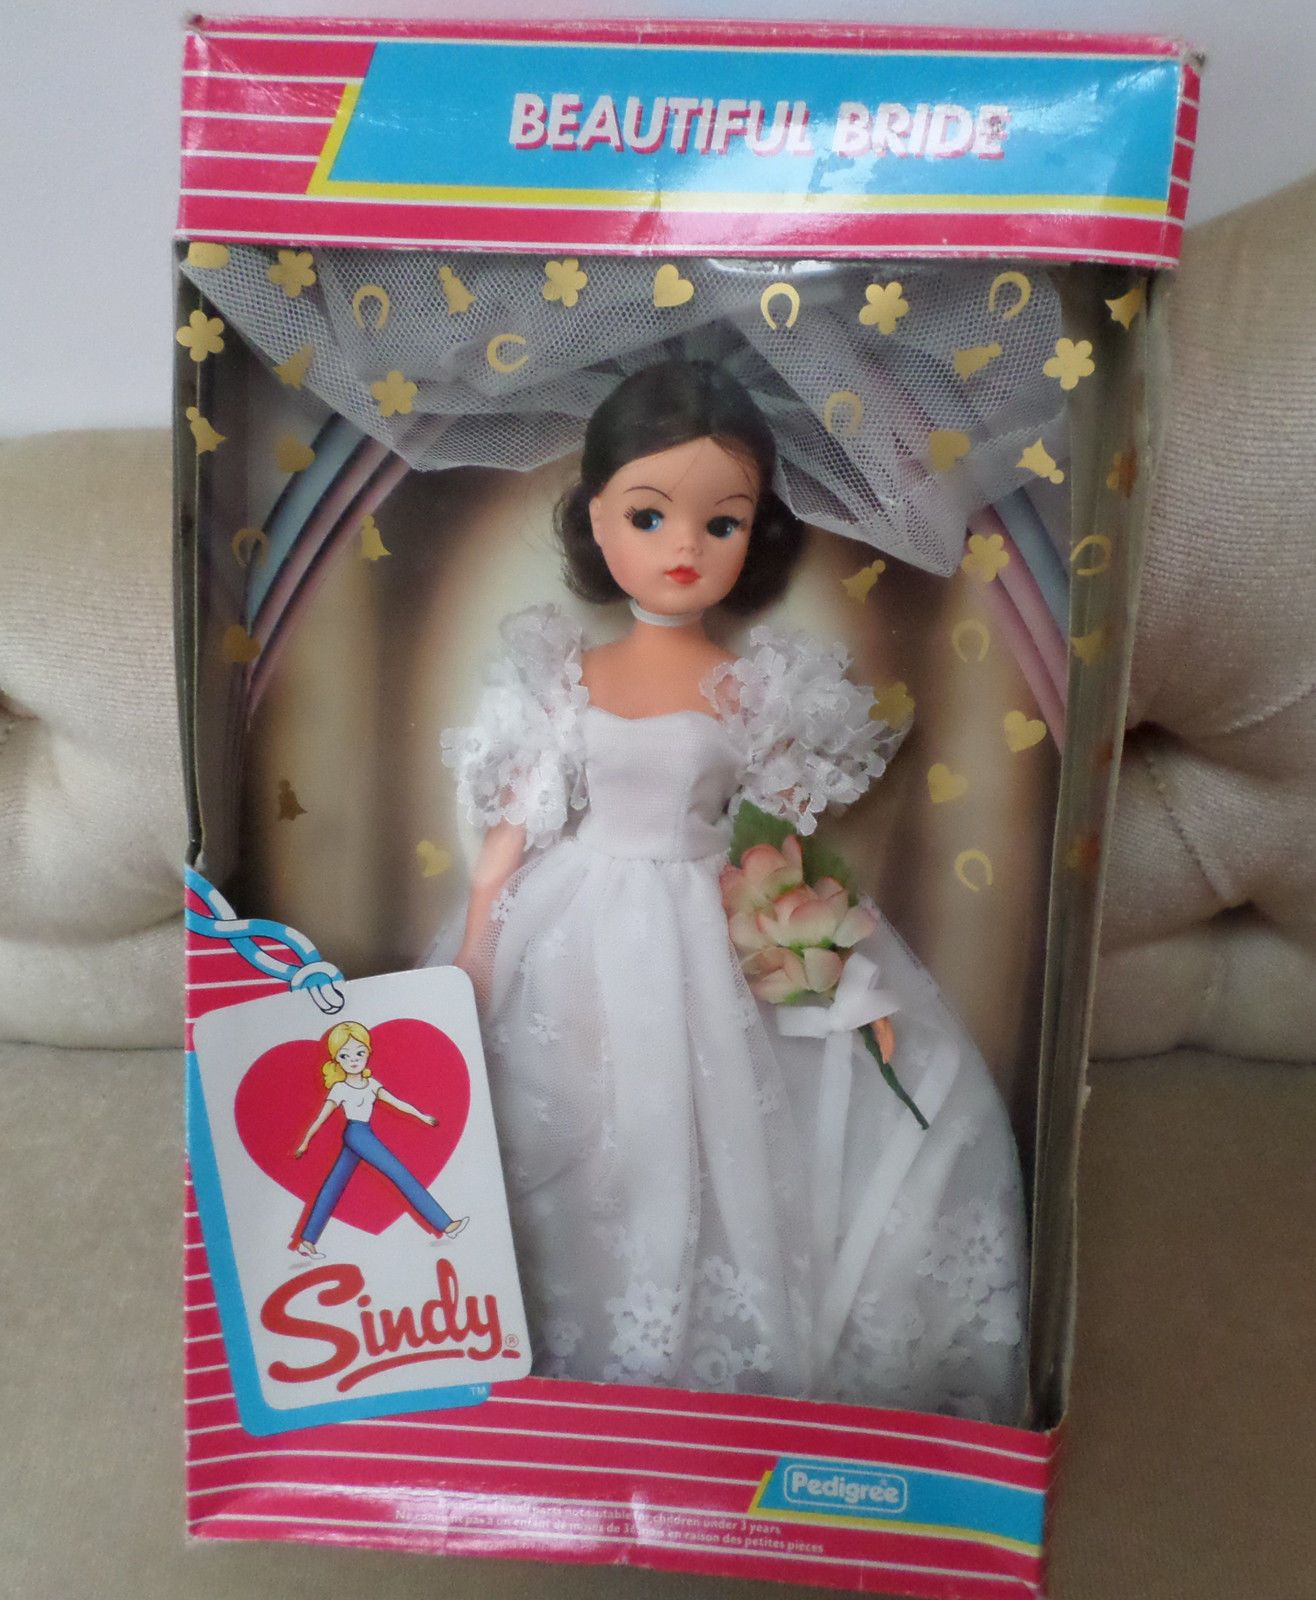 VINTAGE EARLY 80'S BEAUTIFUL BRIDE SINDY DOLL Wedding